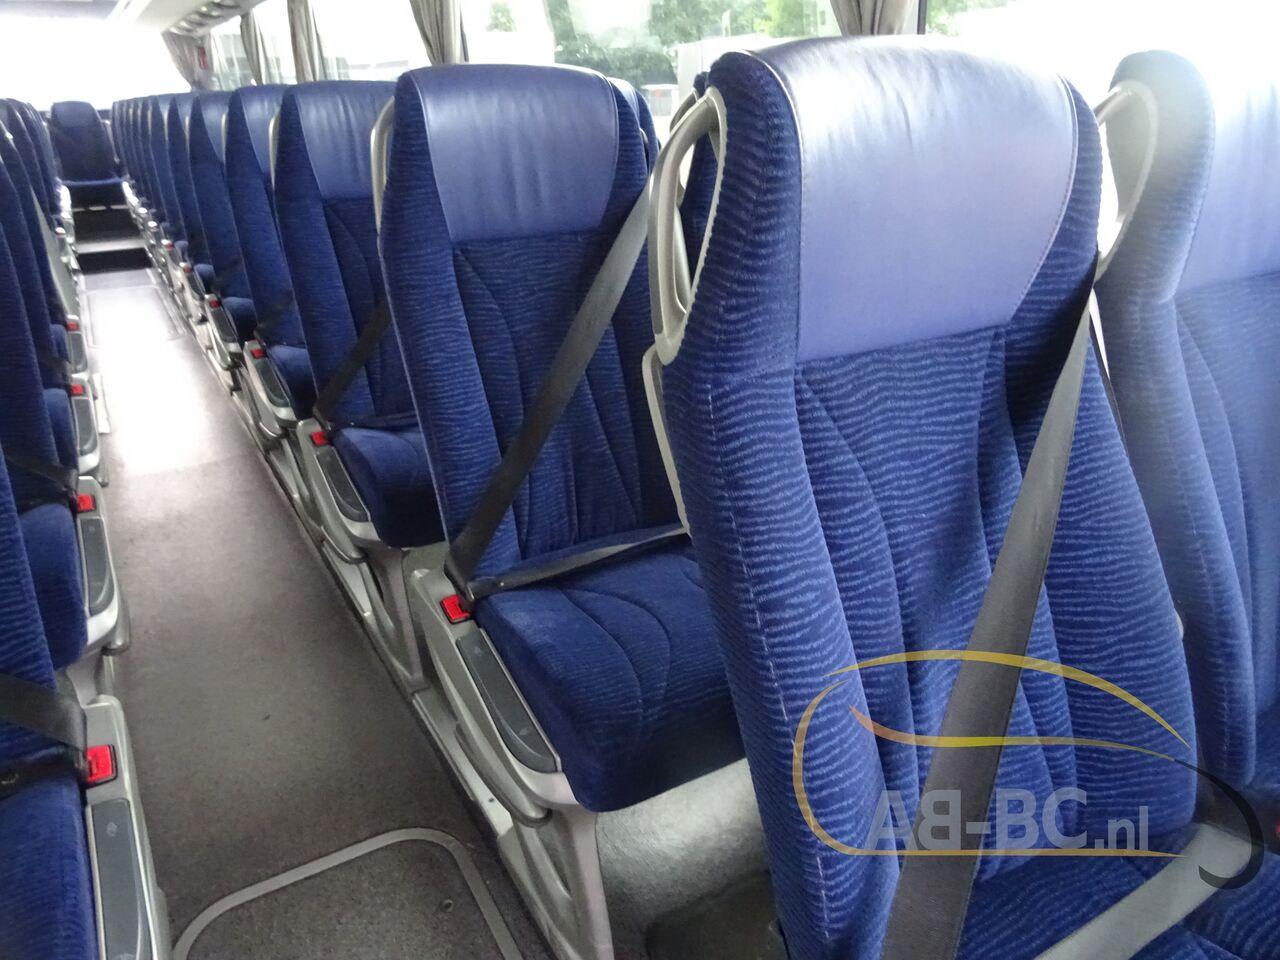 coach-busSETRA-S415-GT-HD-FINAL-EDITION---1627457196768247806_big_ba9c350a7aa302e57e51034df9a7ae82--21050713010665719300